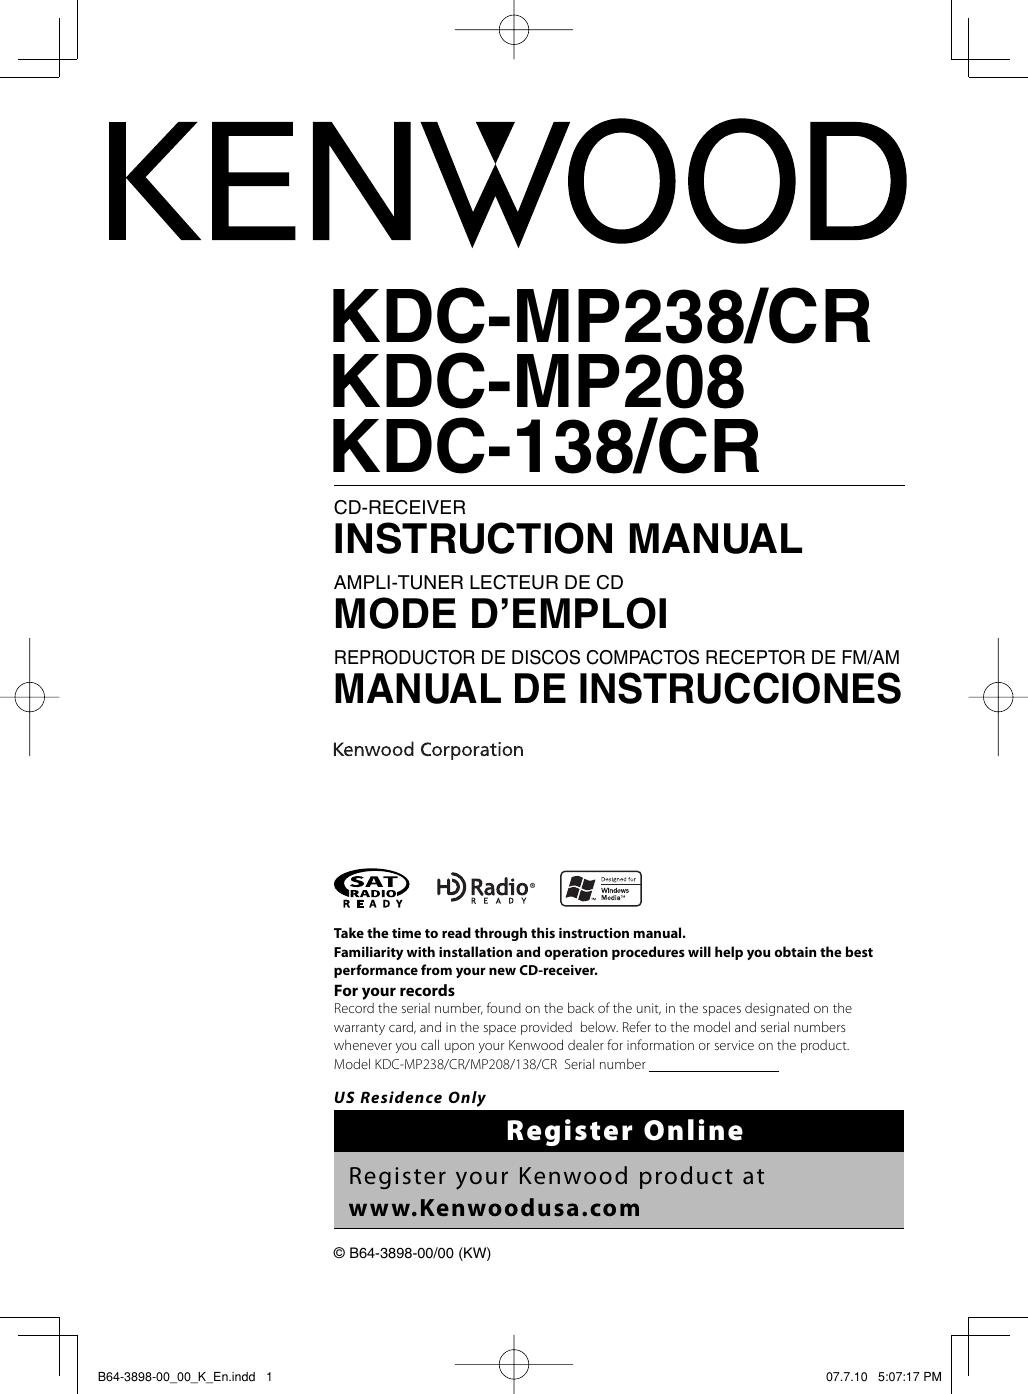 kenwood kdc 138 radio cd player instruction manual b64